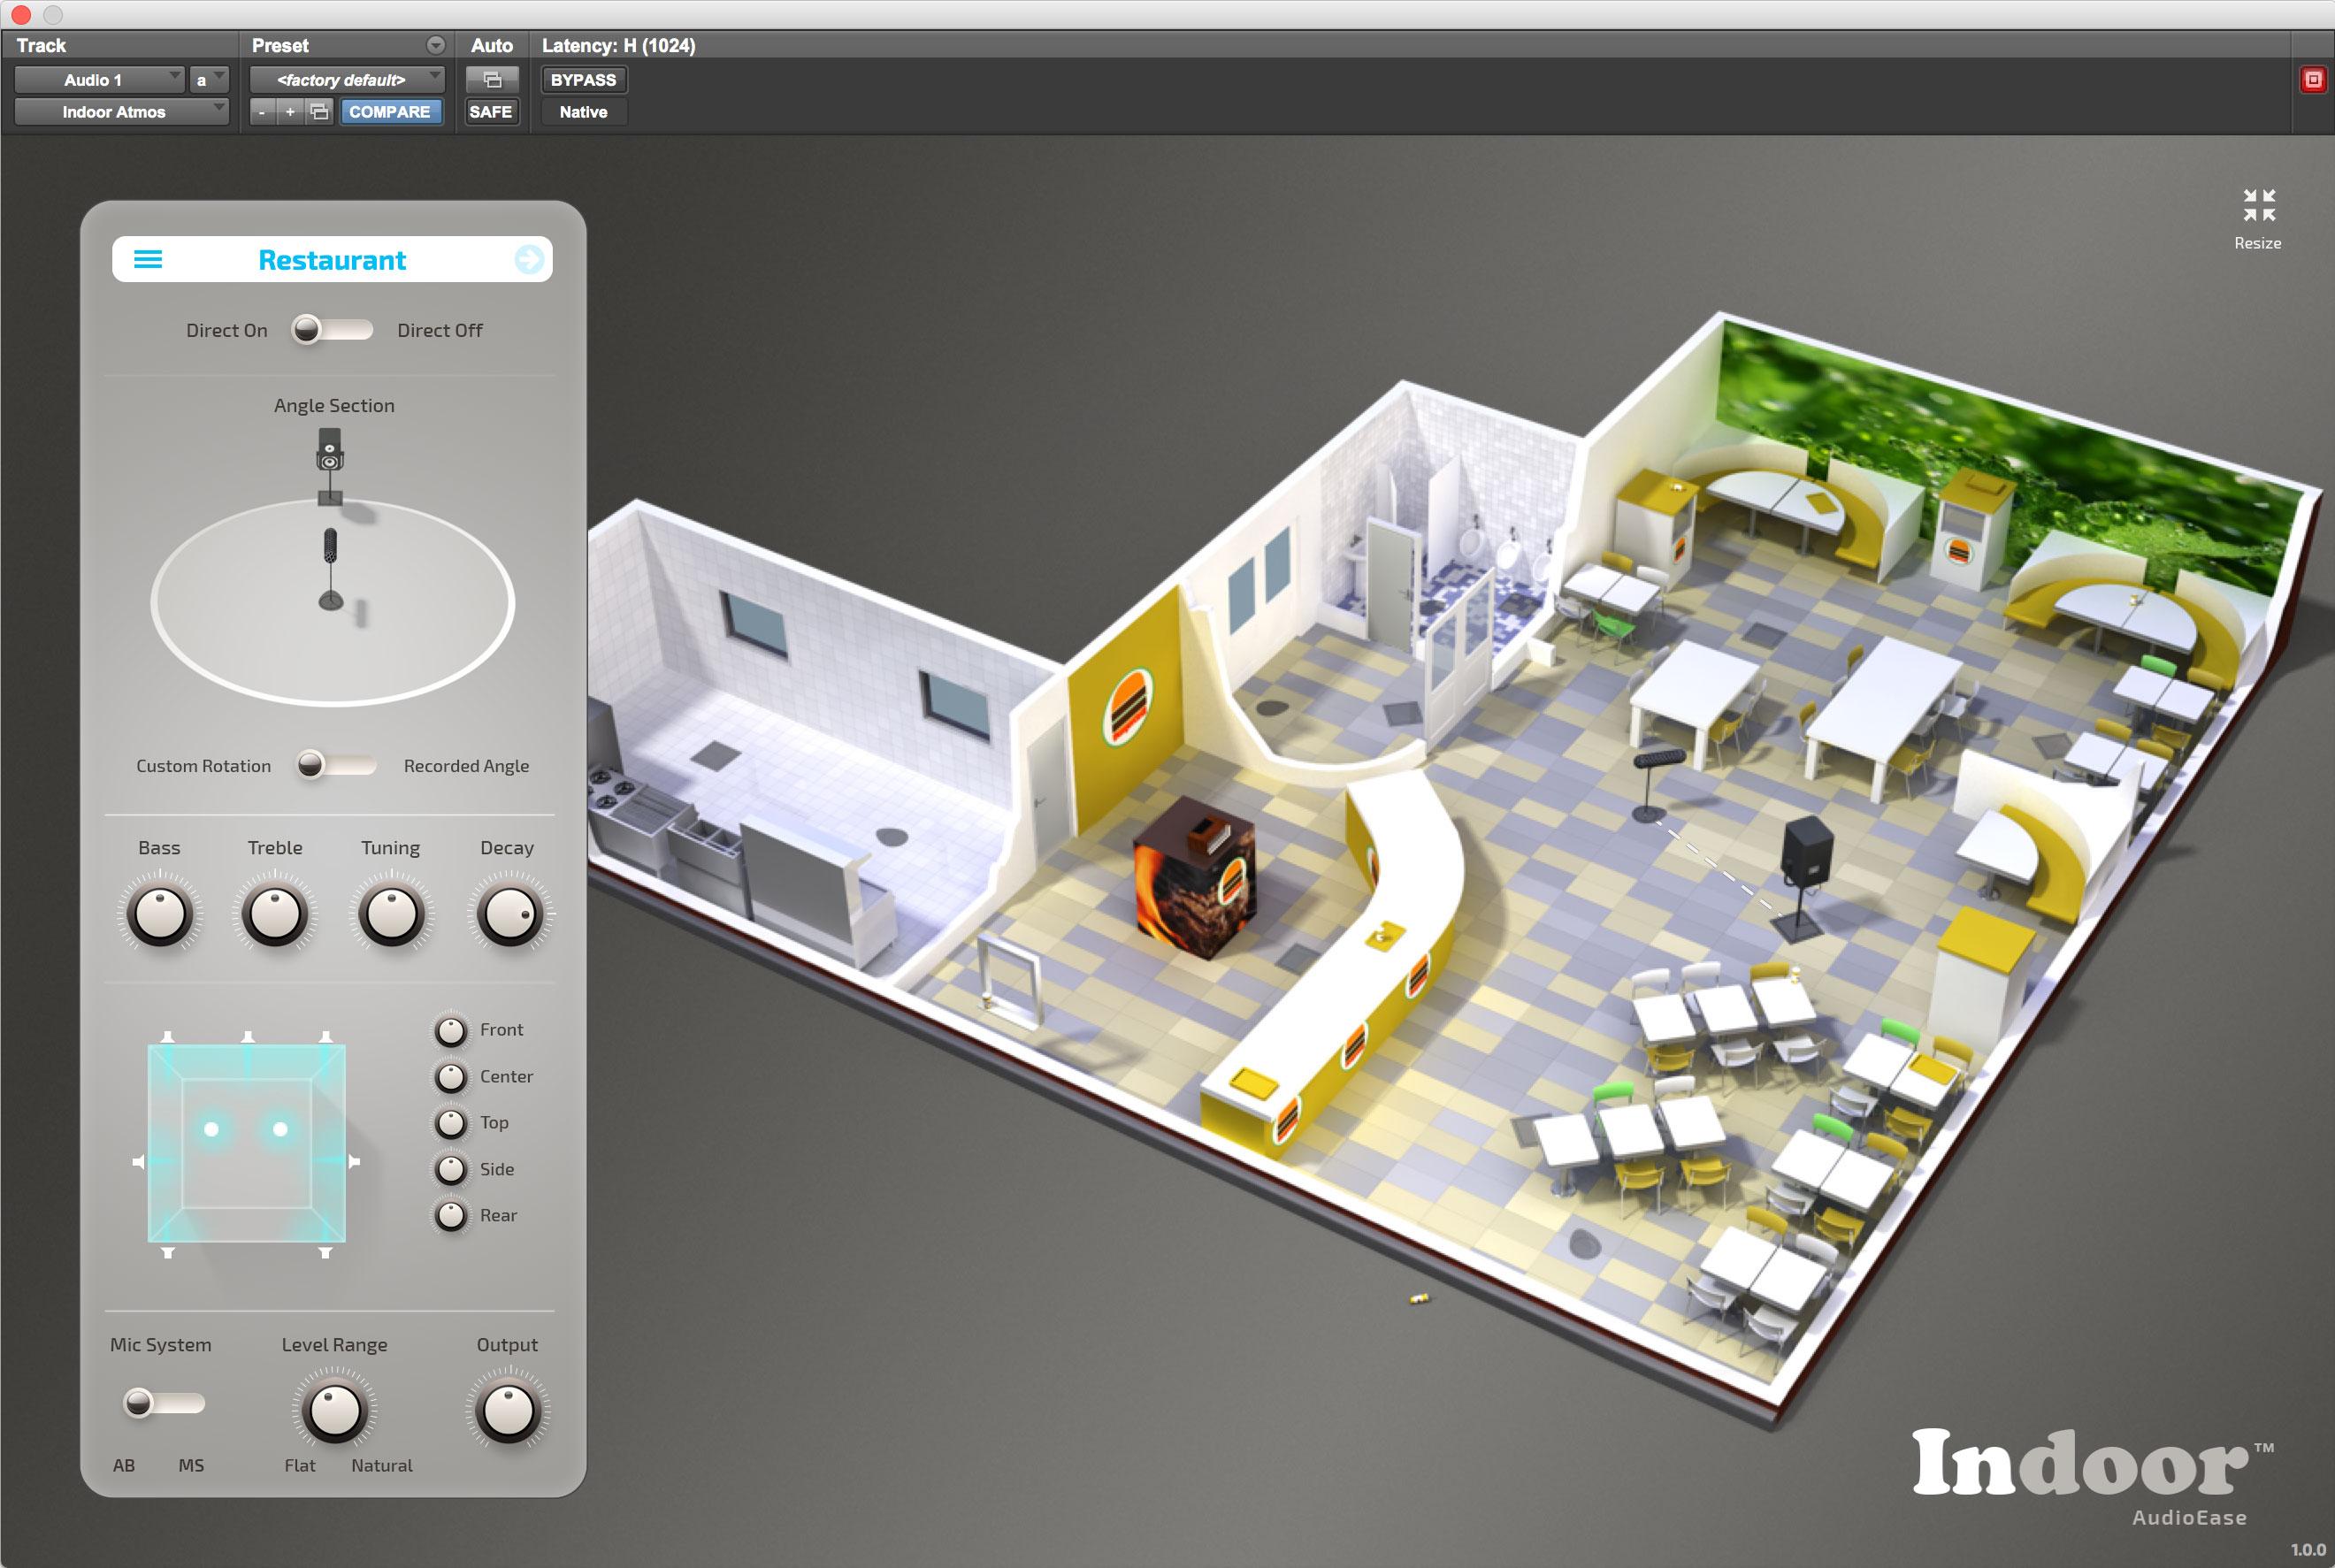 audio ease indoor restaurant acoustics